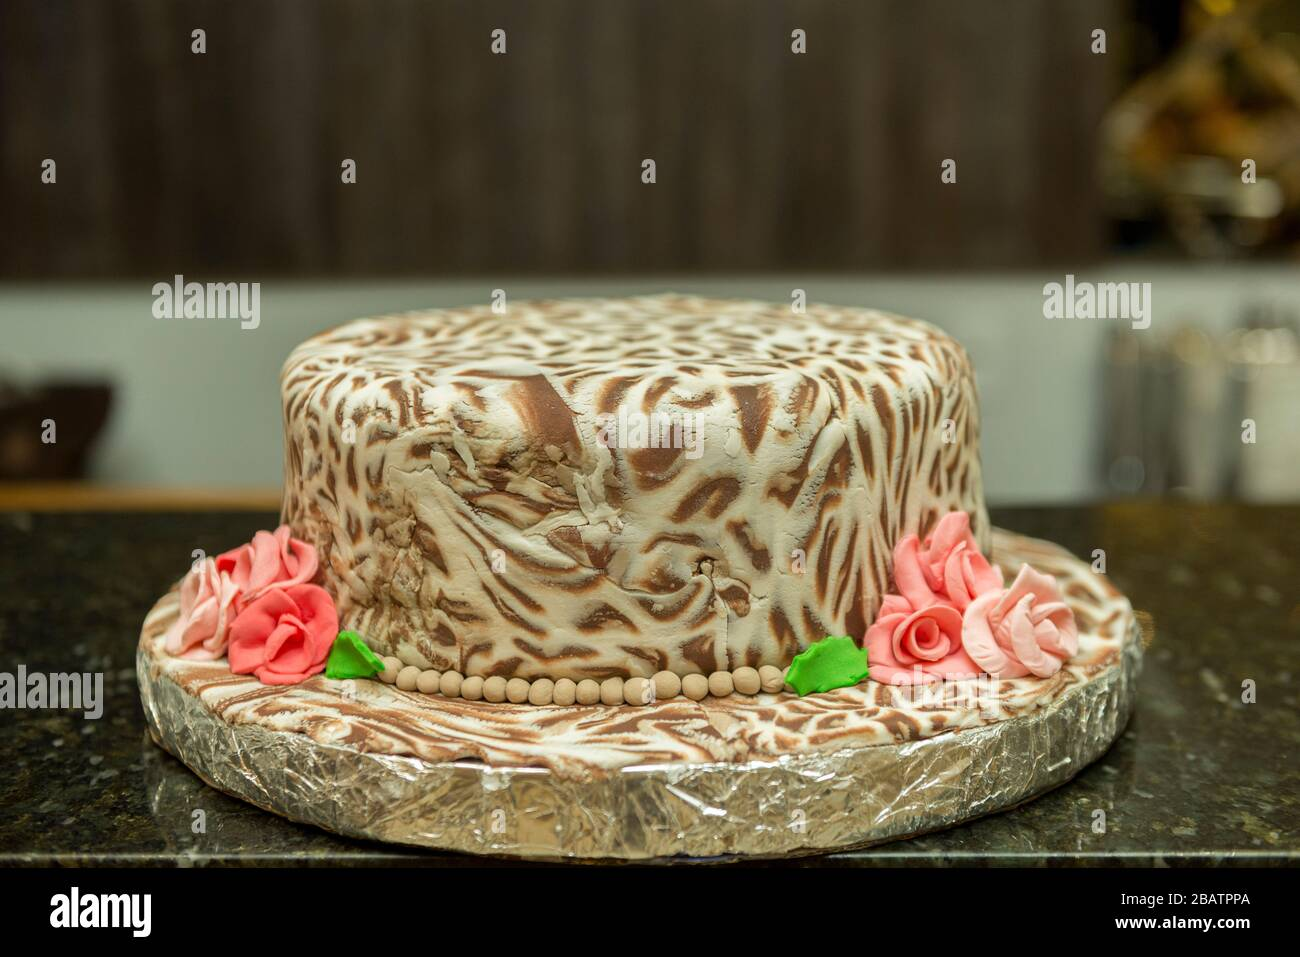 Fantastic Closeup Of Marbled Birthday Cake Of White And Dark Chocolate Funny Birthday Cards Online Necthendildamsfinfo